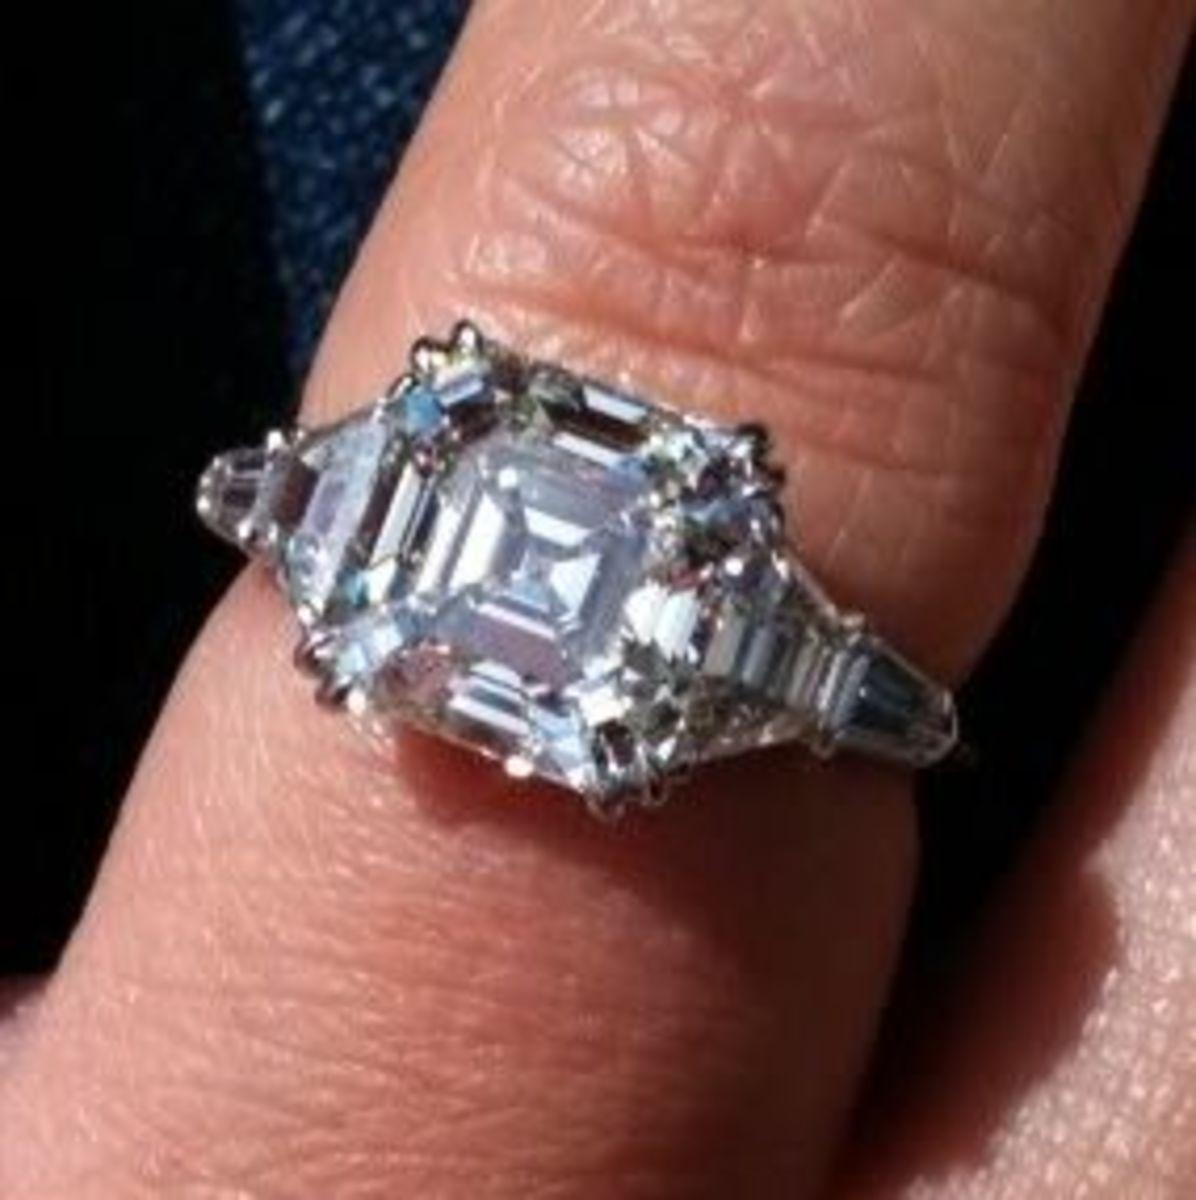 Asscher cut diamonds look great in K L M color